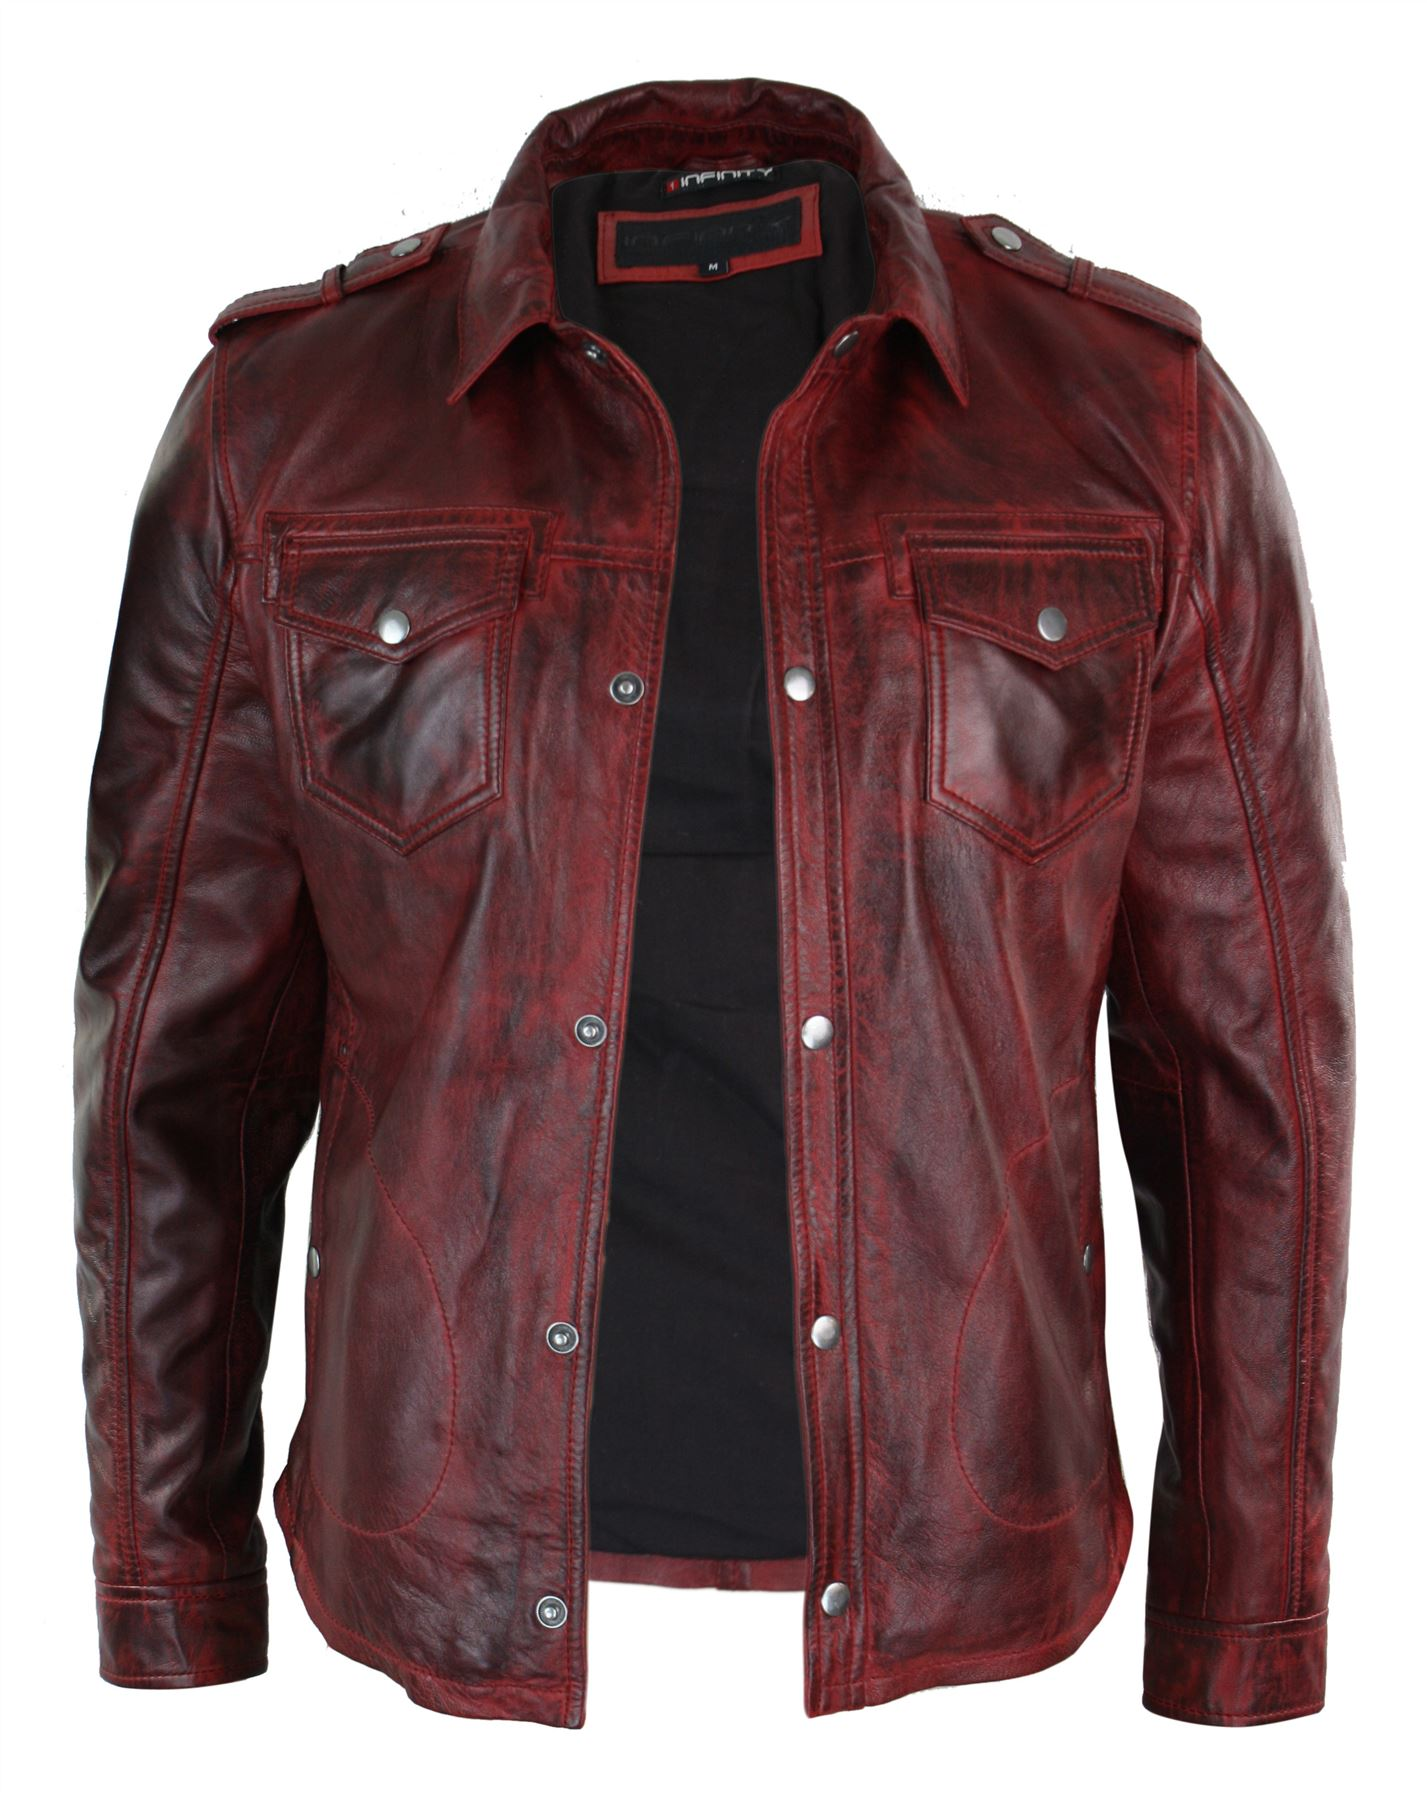 veste homme cuir v ritable marron rouge d lav coupe cintr e boutonn e r tro ebay. Black Bedroom Furniture Sets. Home Design Ideas